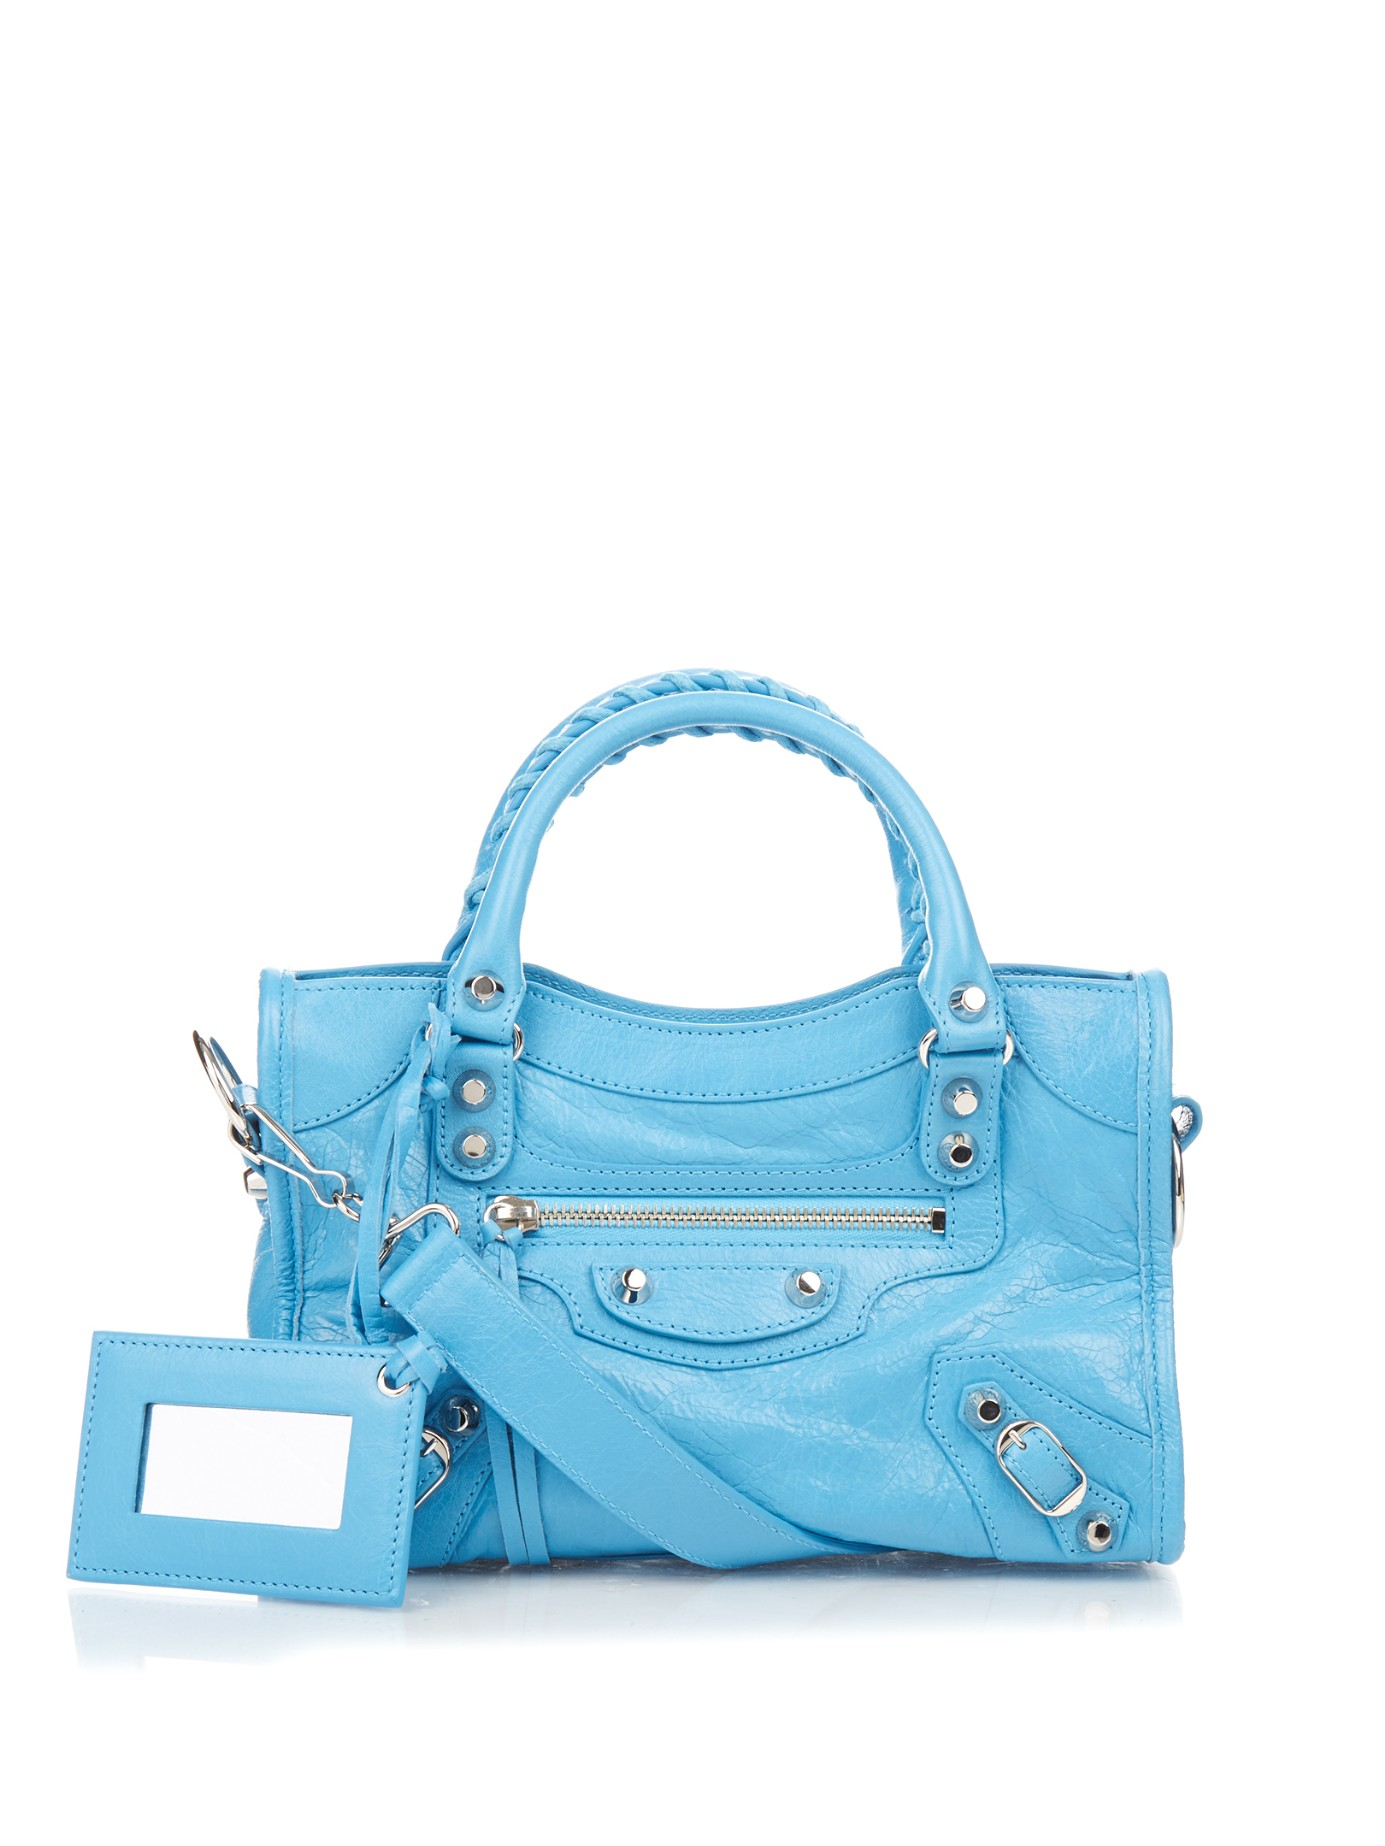 Balenciaga Giant 12 Mini City Crossbody Bag